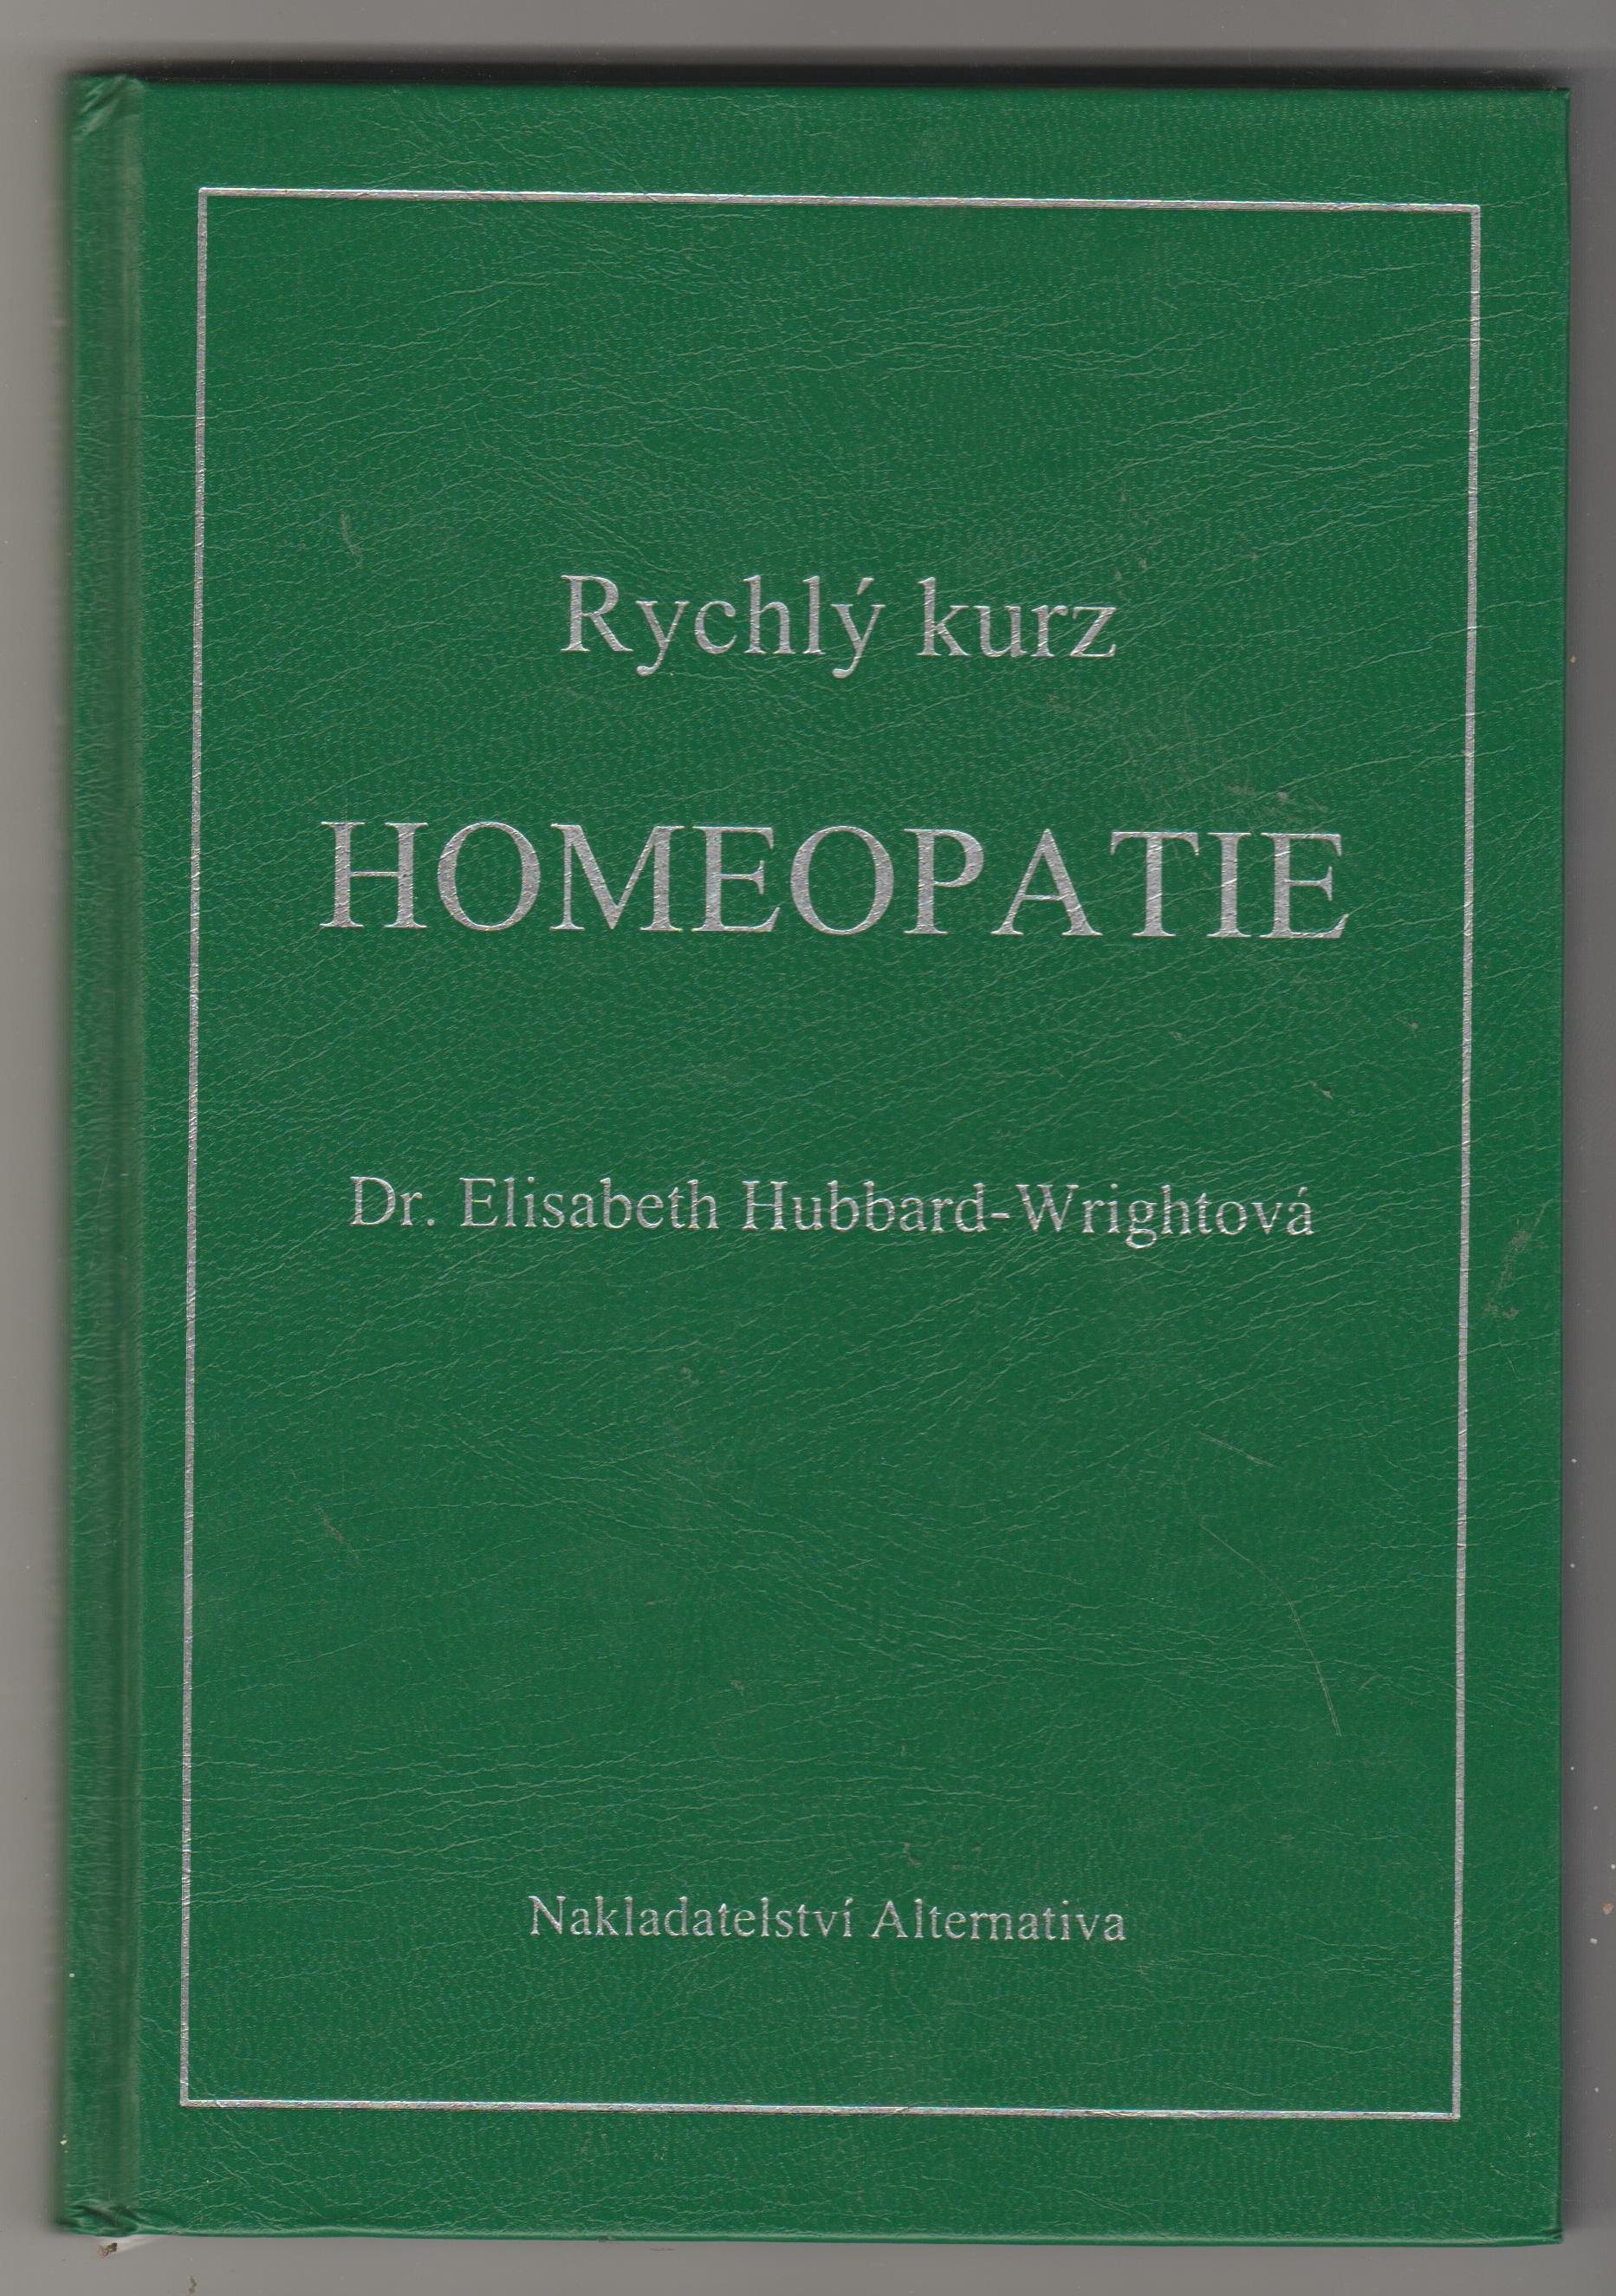 Rychlý kurz homeopatie - Dr. Elisabeth Hubbard-Wrightová